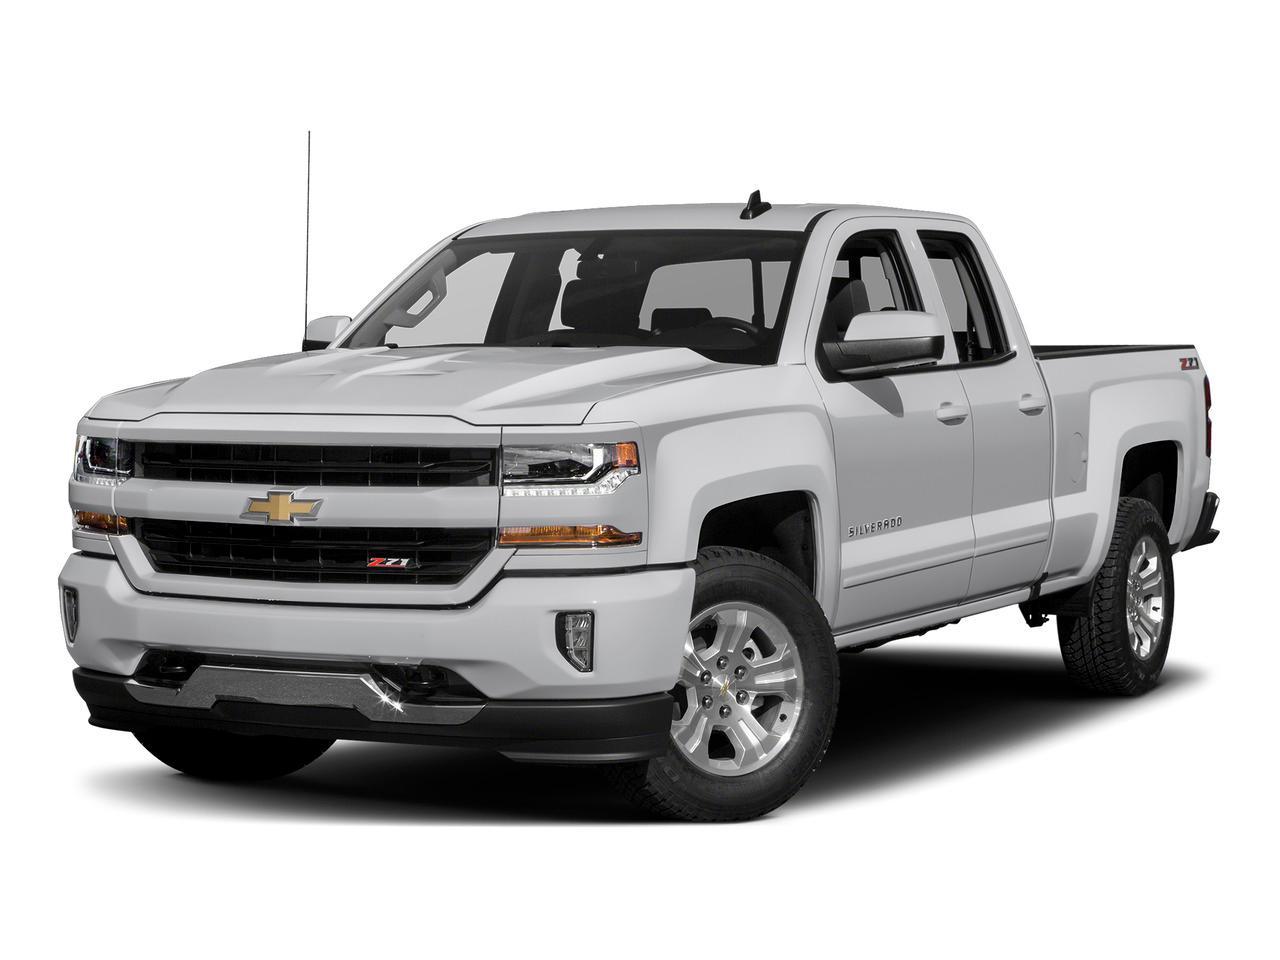 2016 Chevrolet Silverado 1500 Vehicle Photo in TERRYVILLE, CT 06786-5904